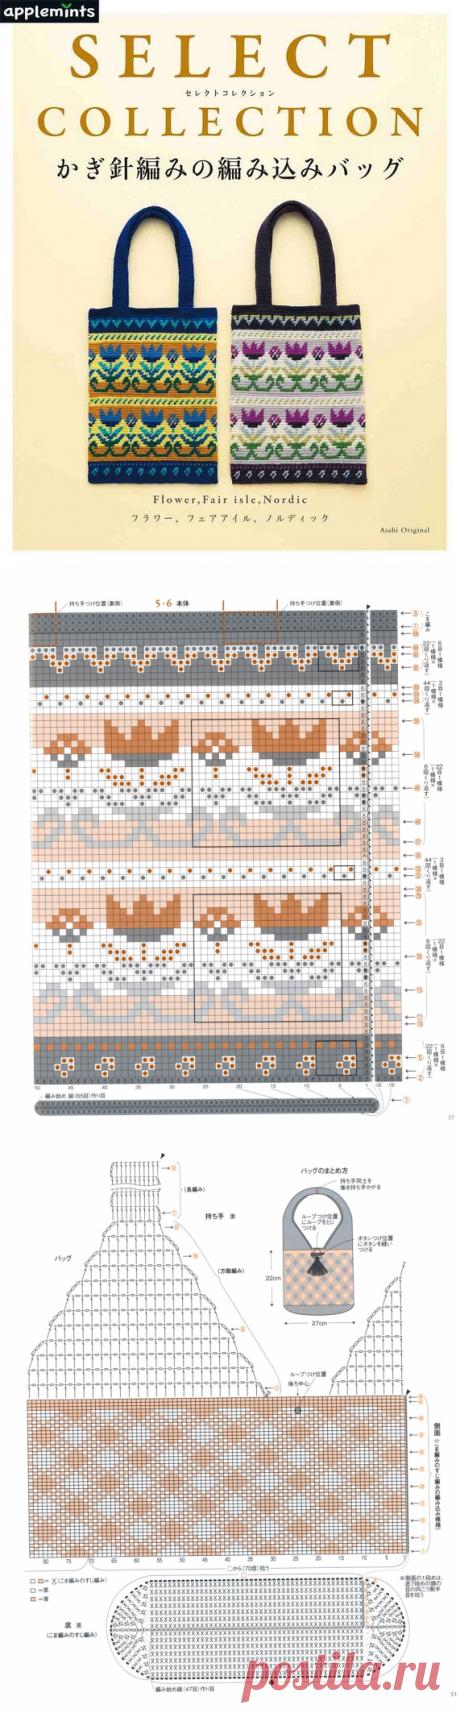 Asahi Original - Crochet braided bag 2019